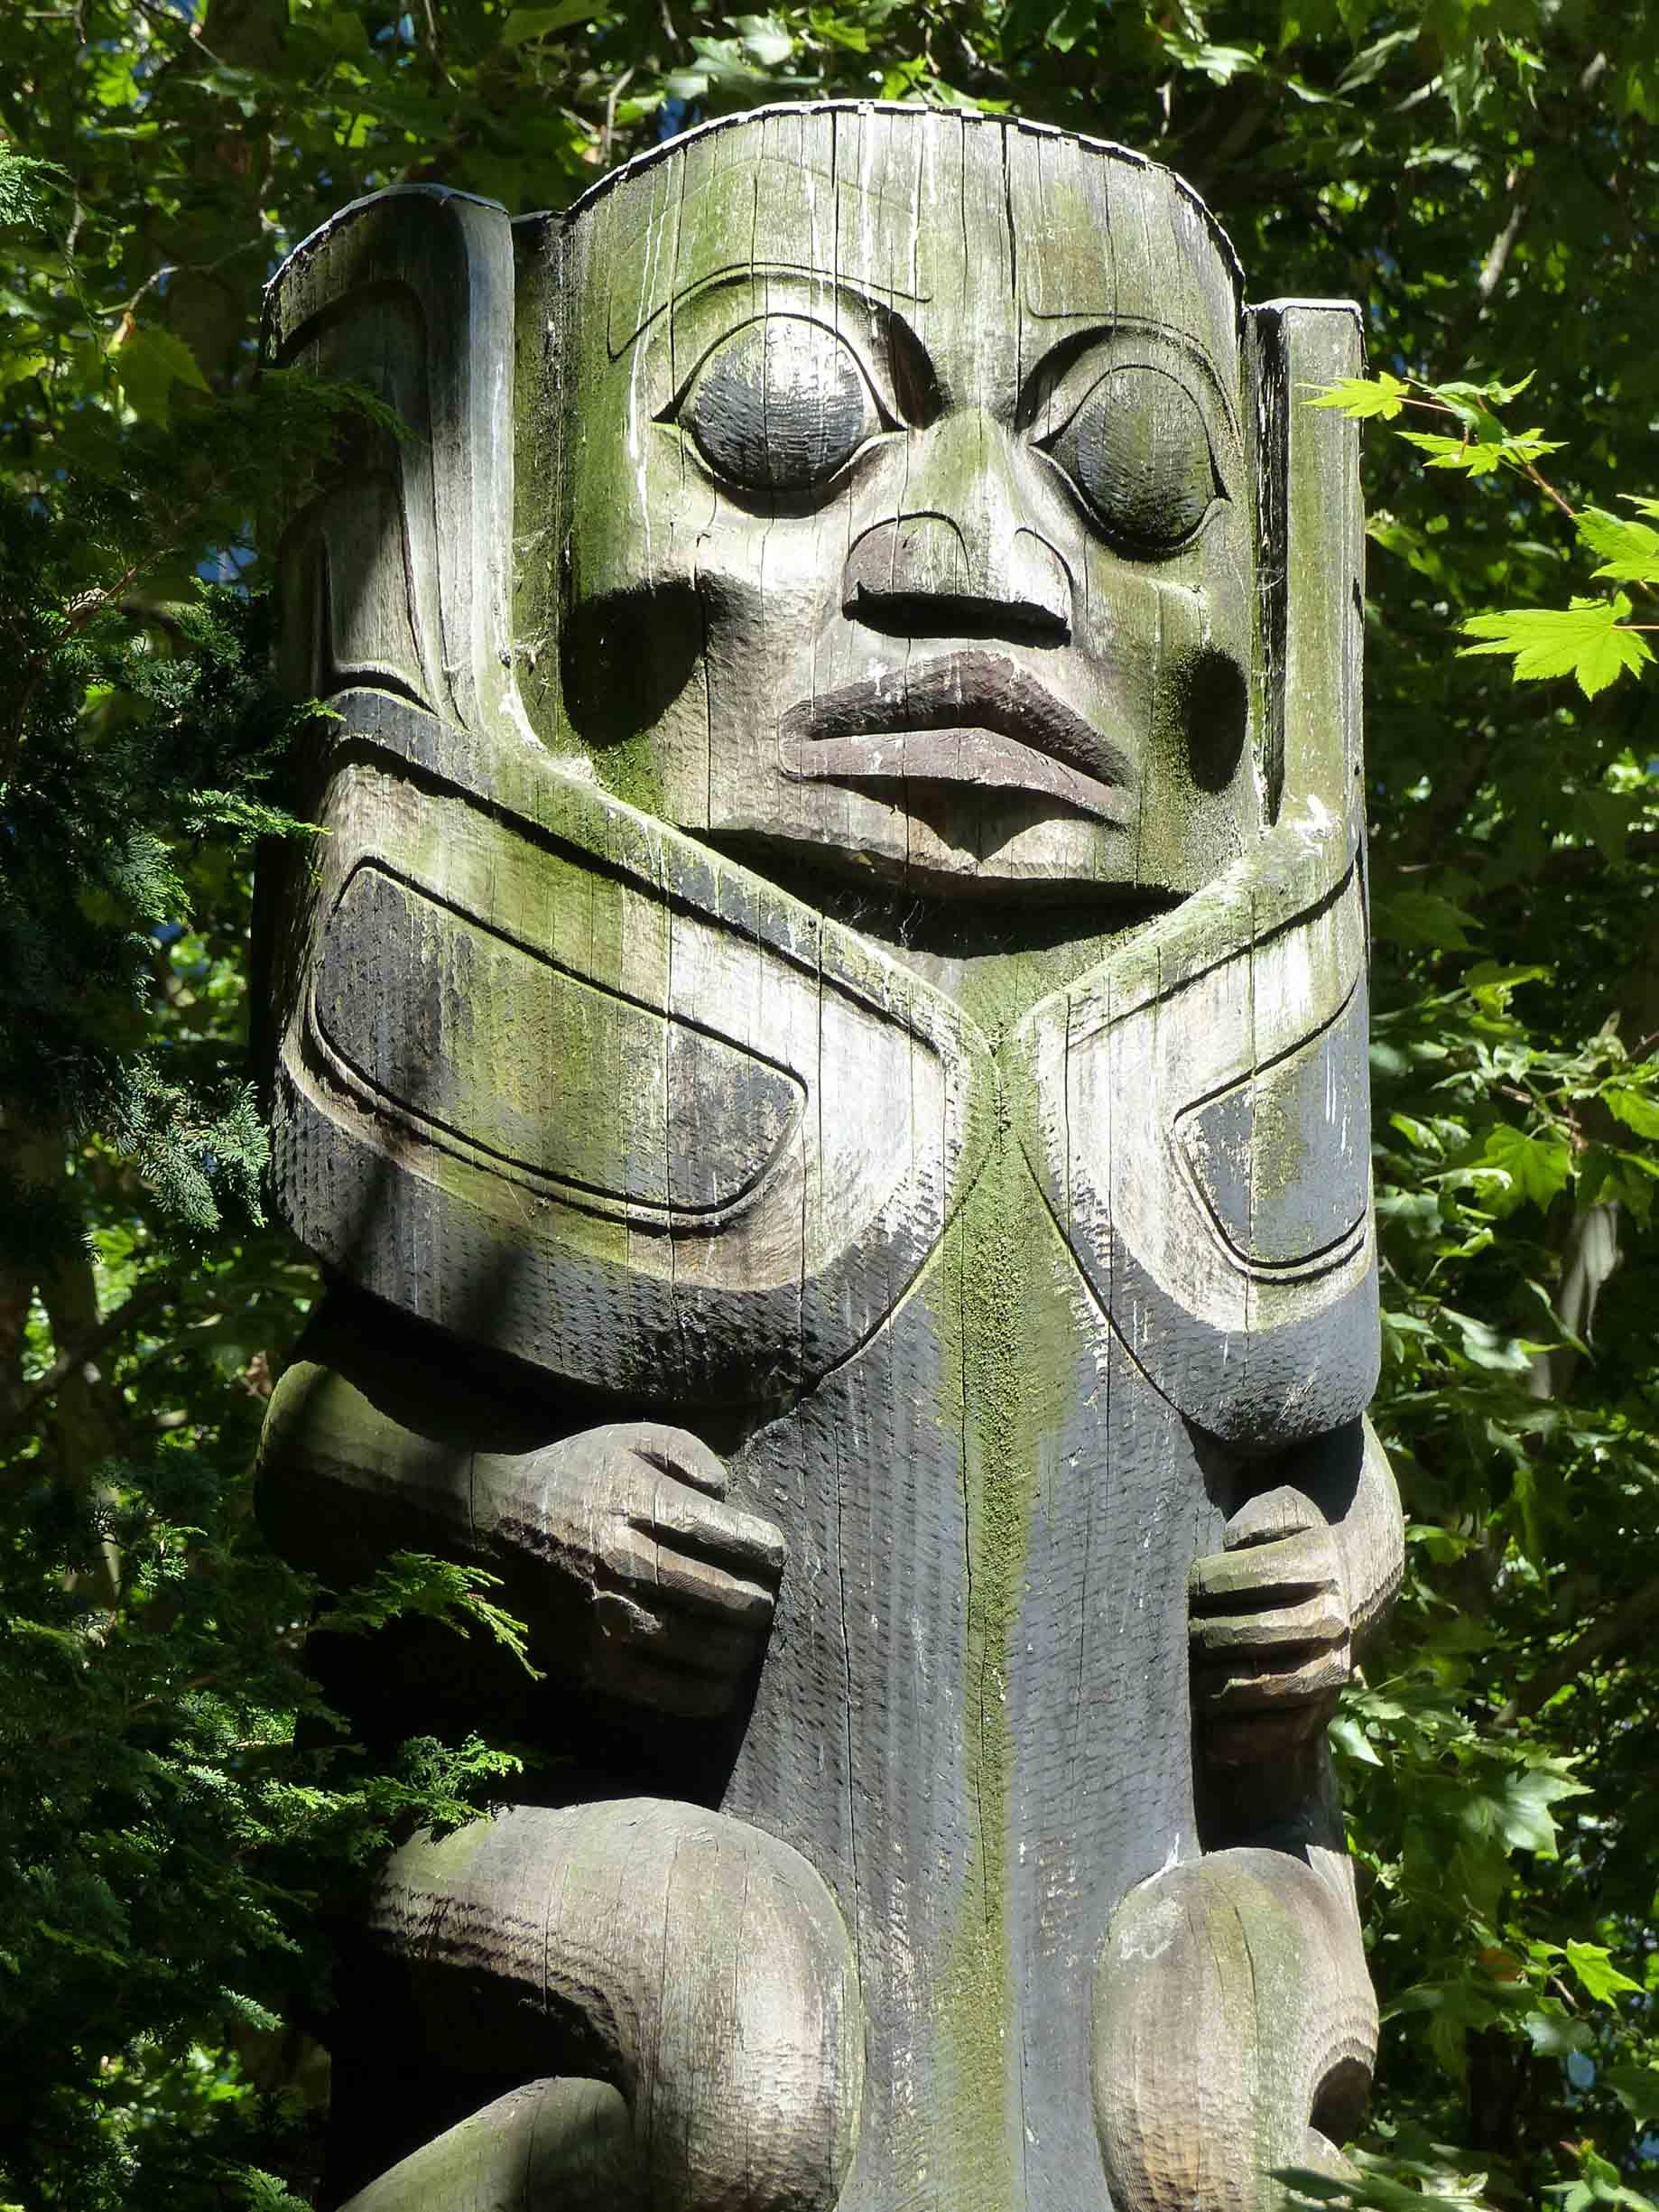 Wooden carved totem pole